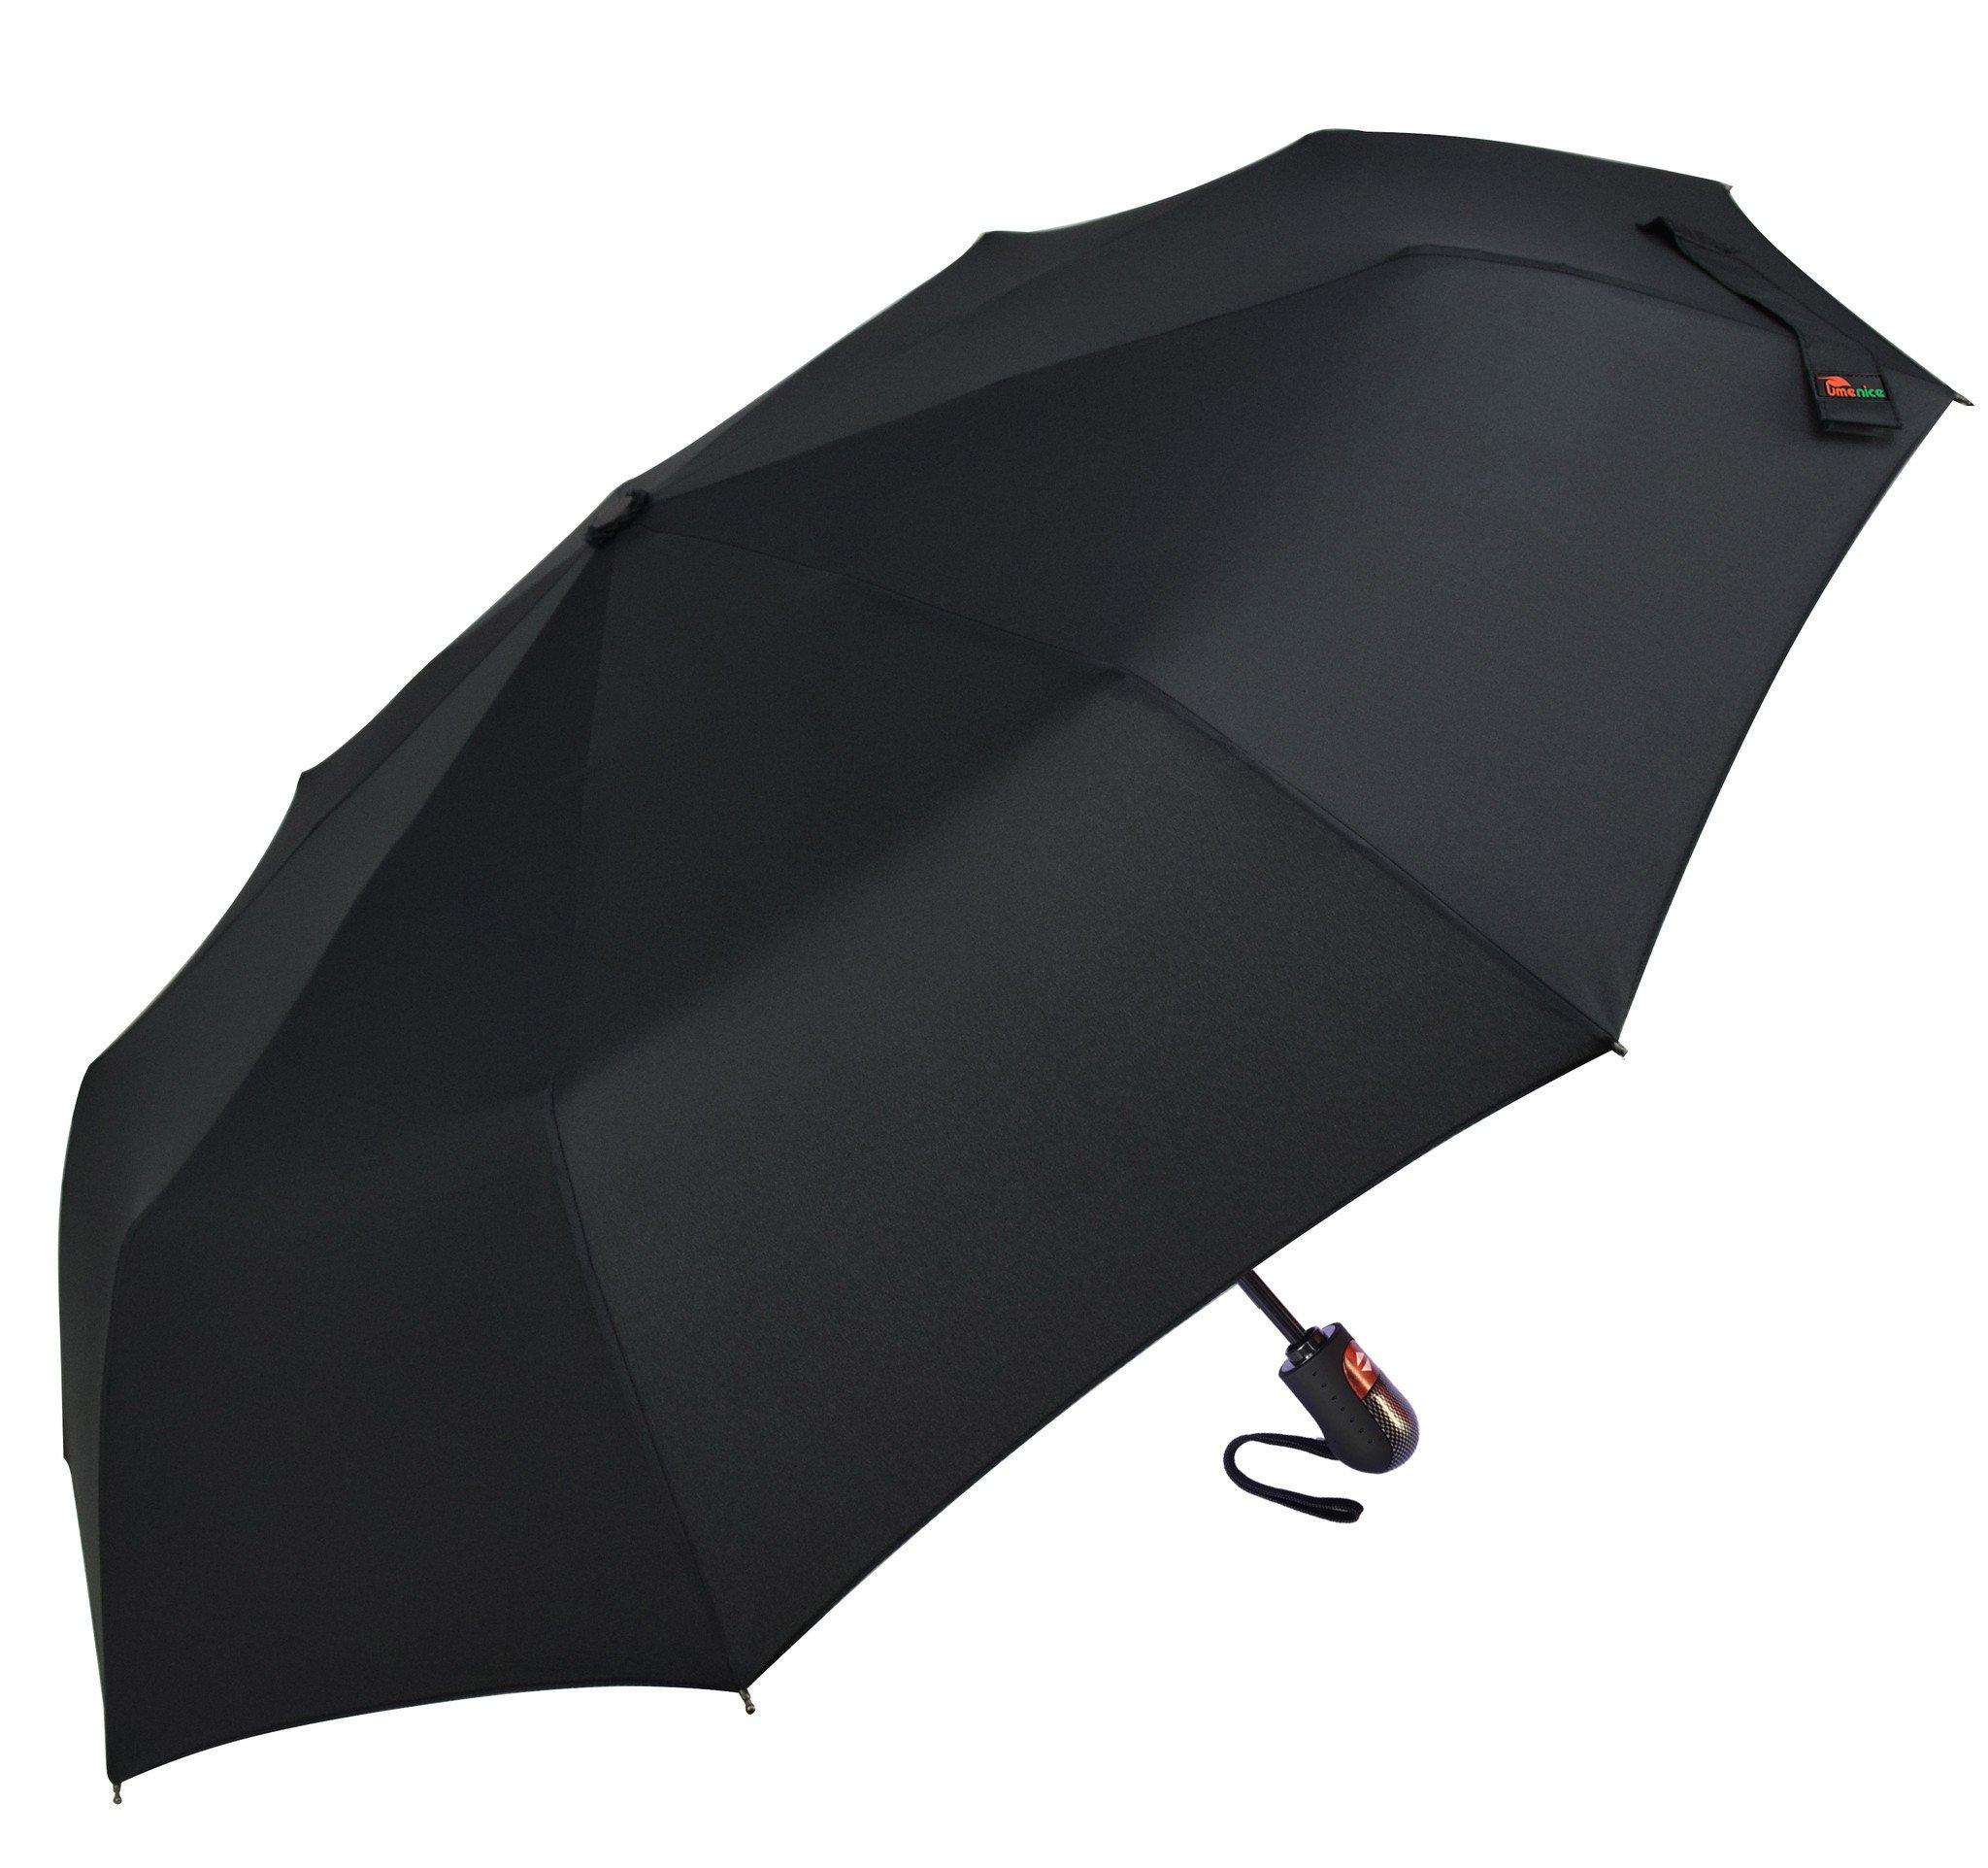 Umenice Auto Open And Closed travel umbrella 9 Ribs Black by Umenice (Image #2)